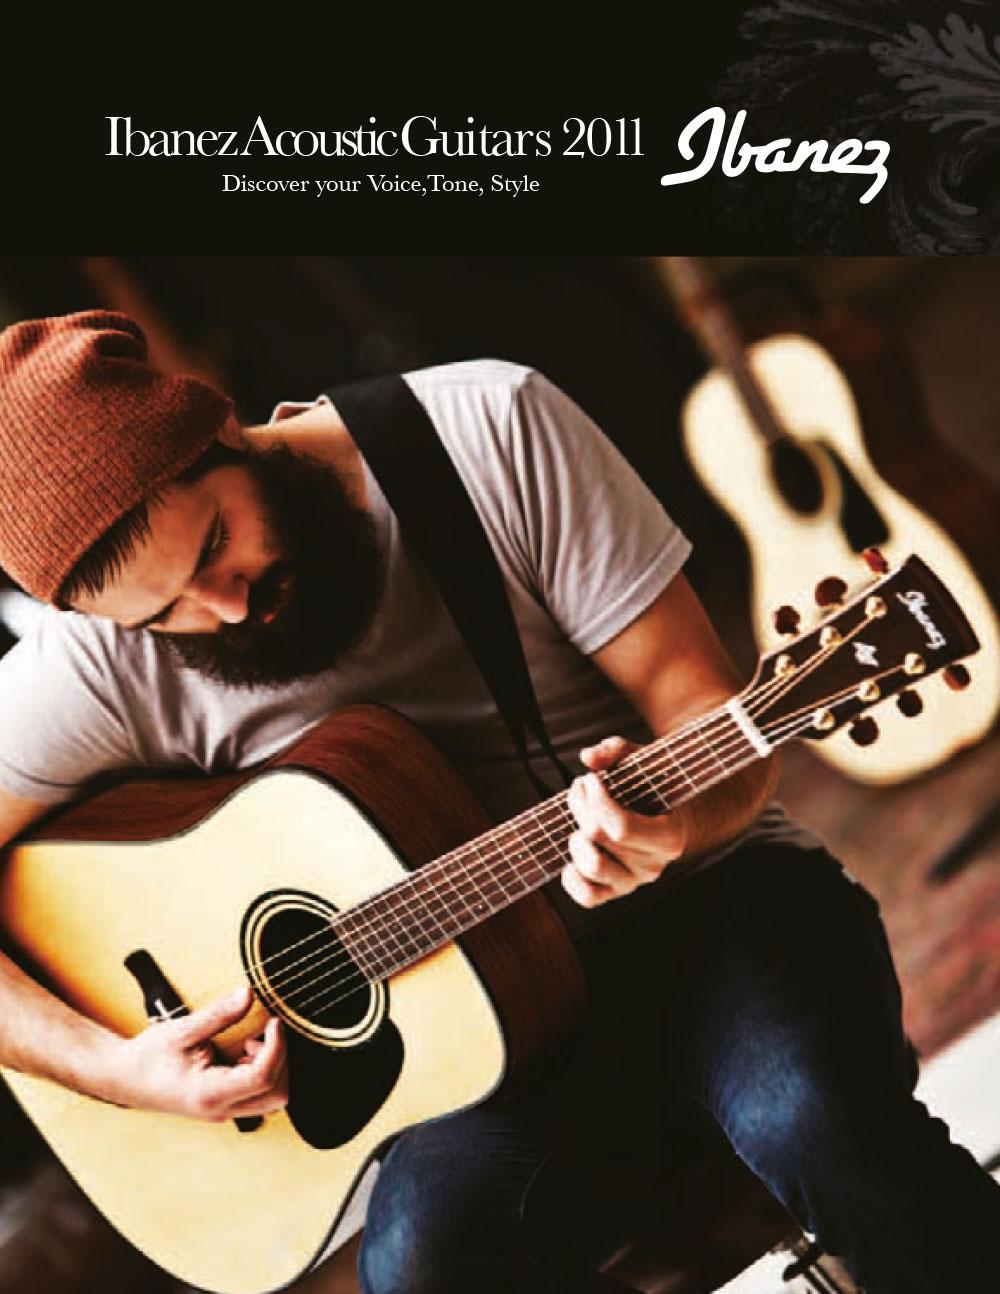 2011 Ibanez Acoustic